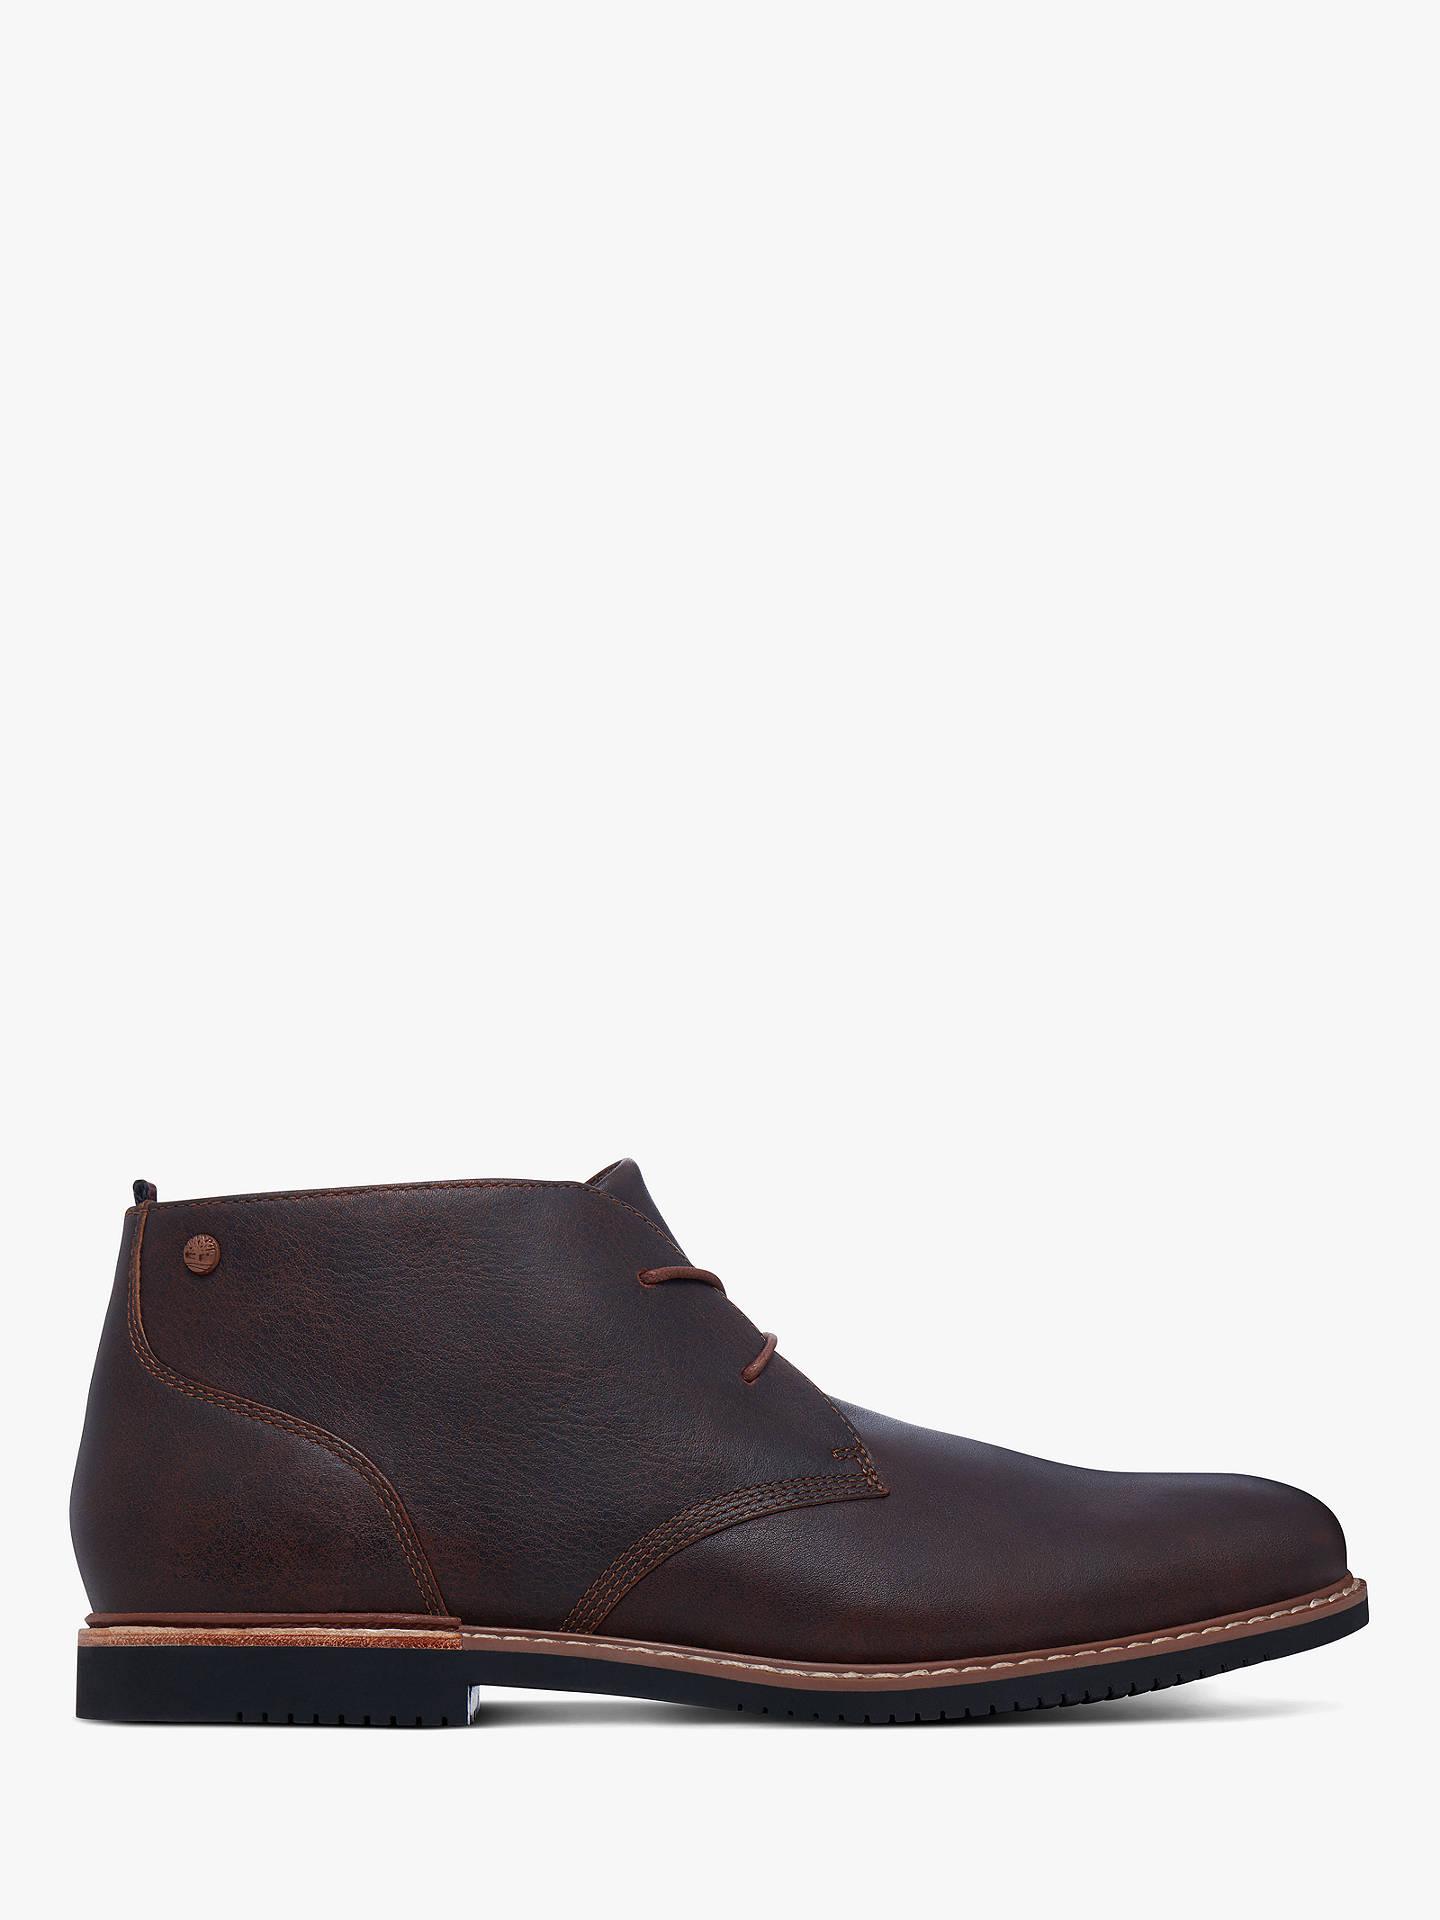 1f841ab7b6a Buy Timberland Brook Park Chukka Boots